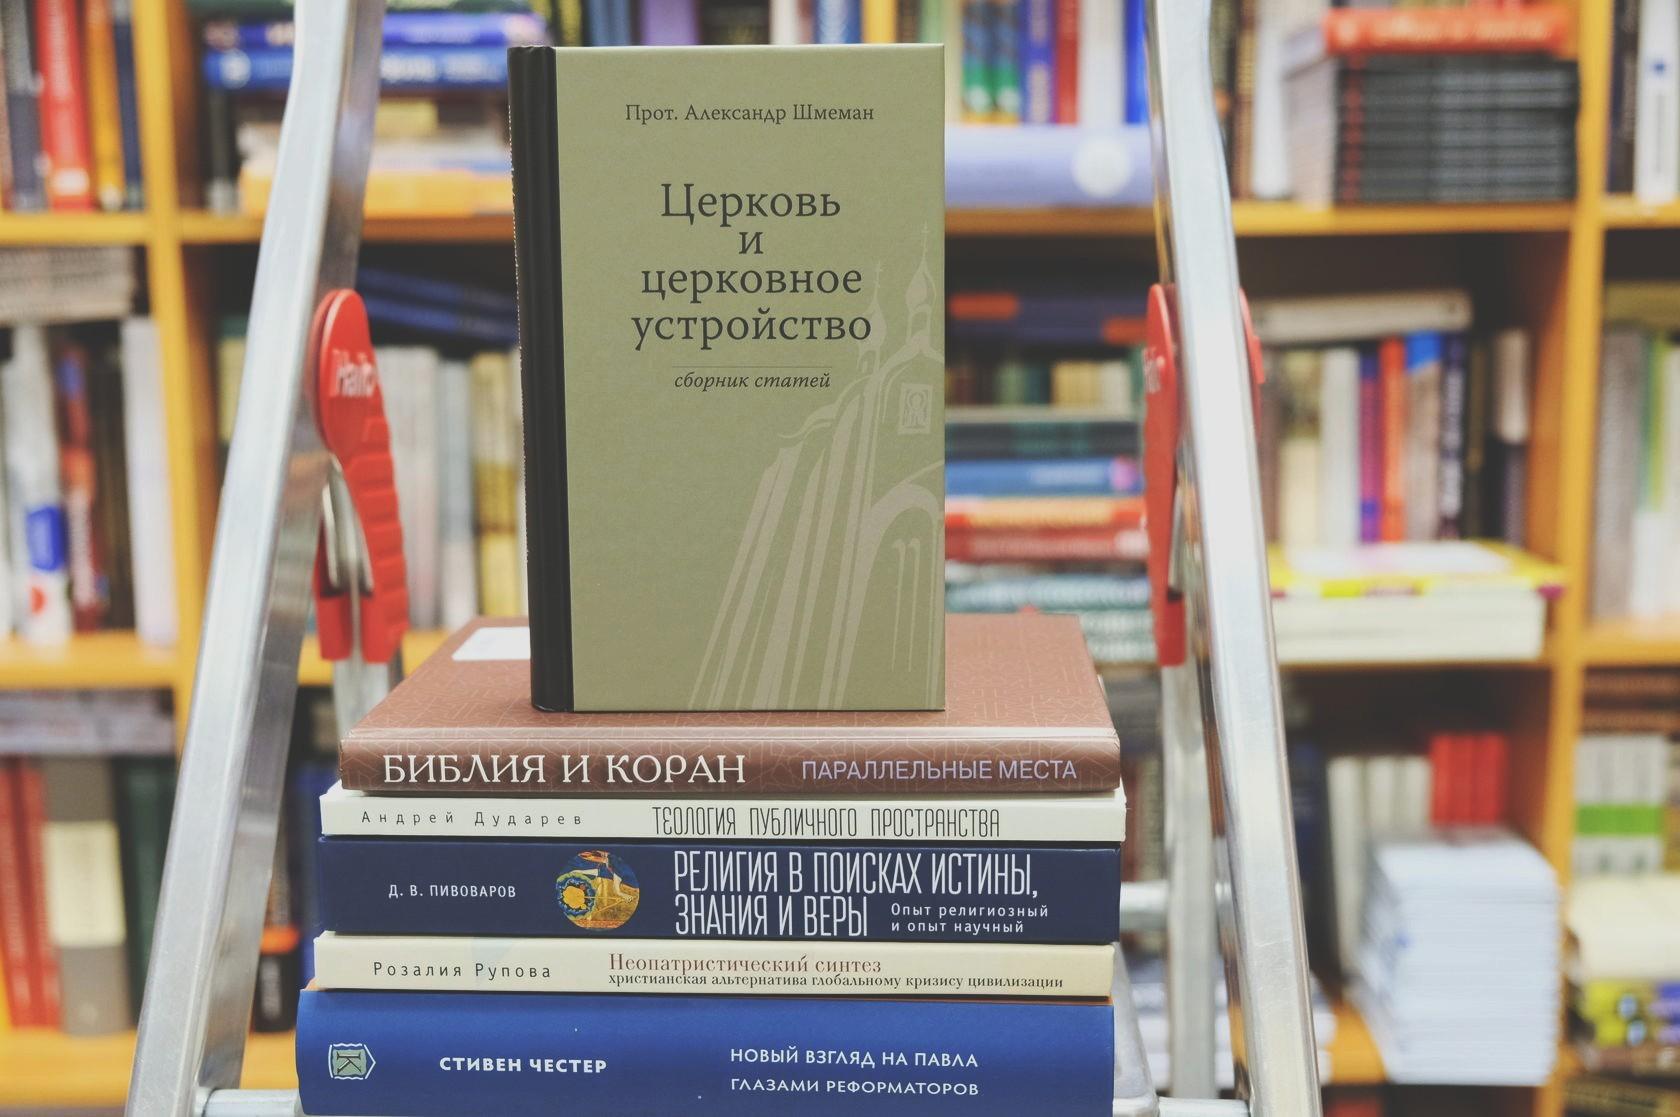 богословие христианство книги